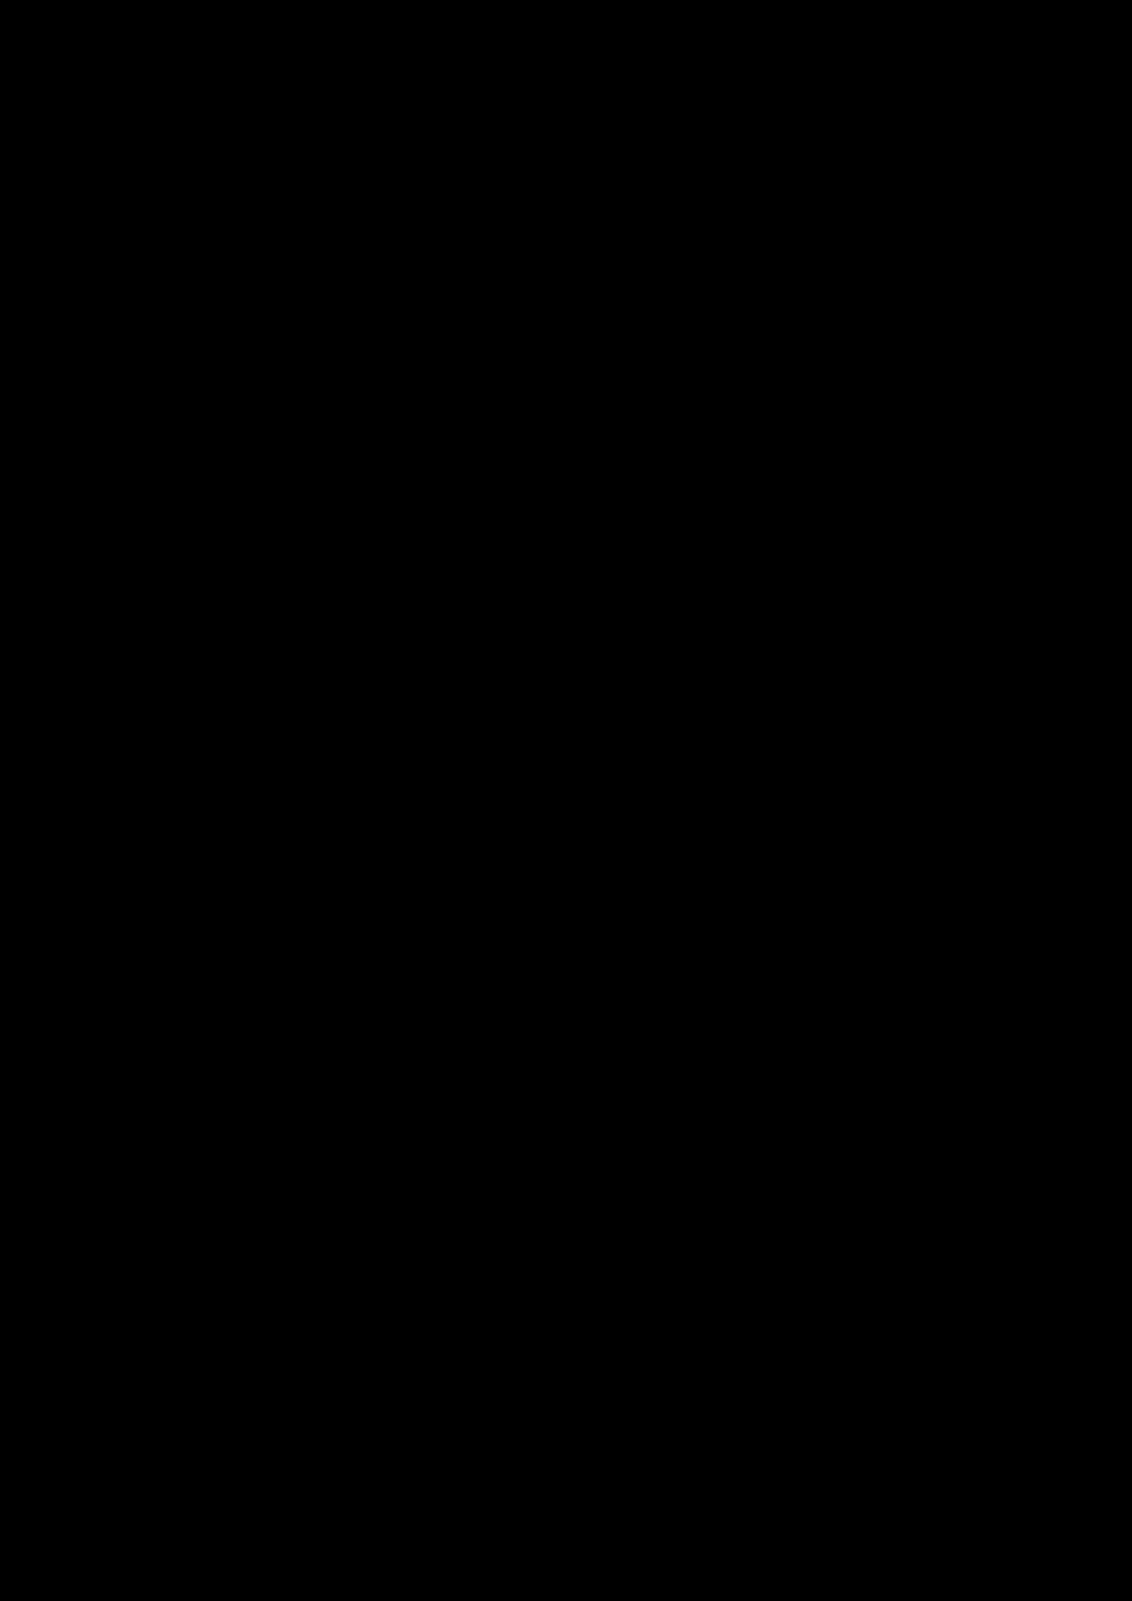 18 berez slide, Image 11